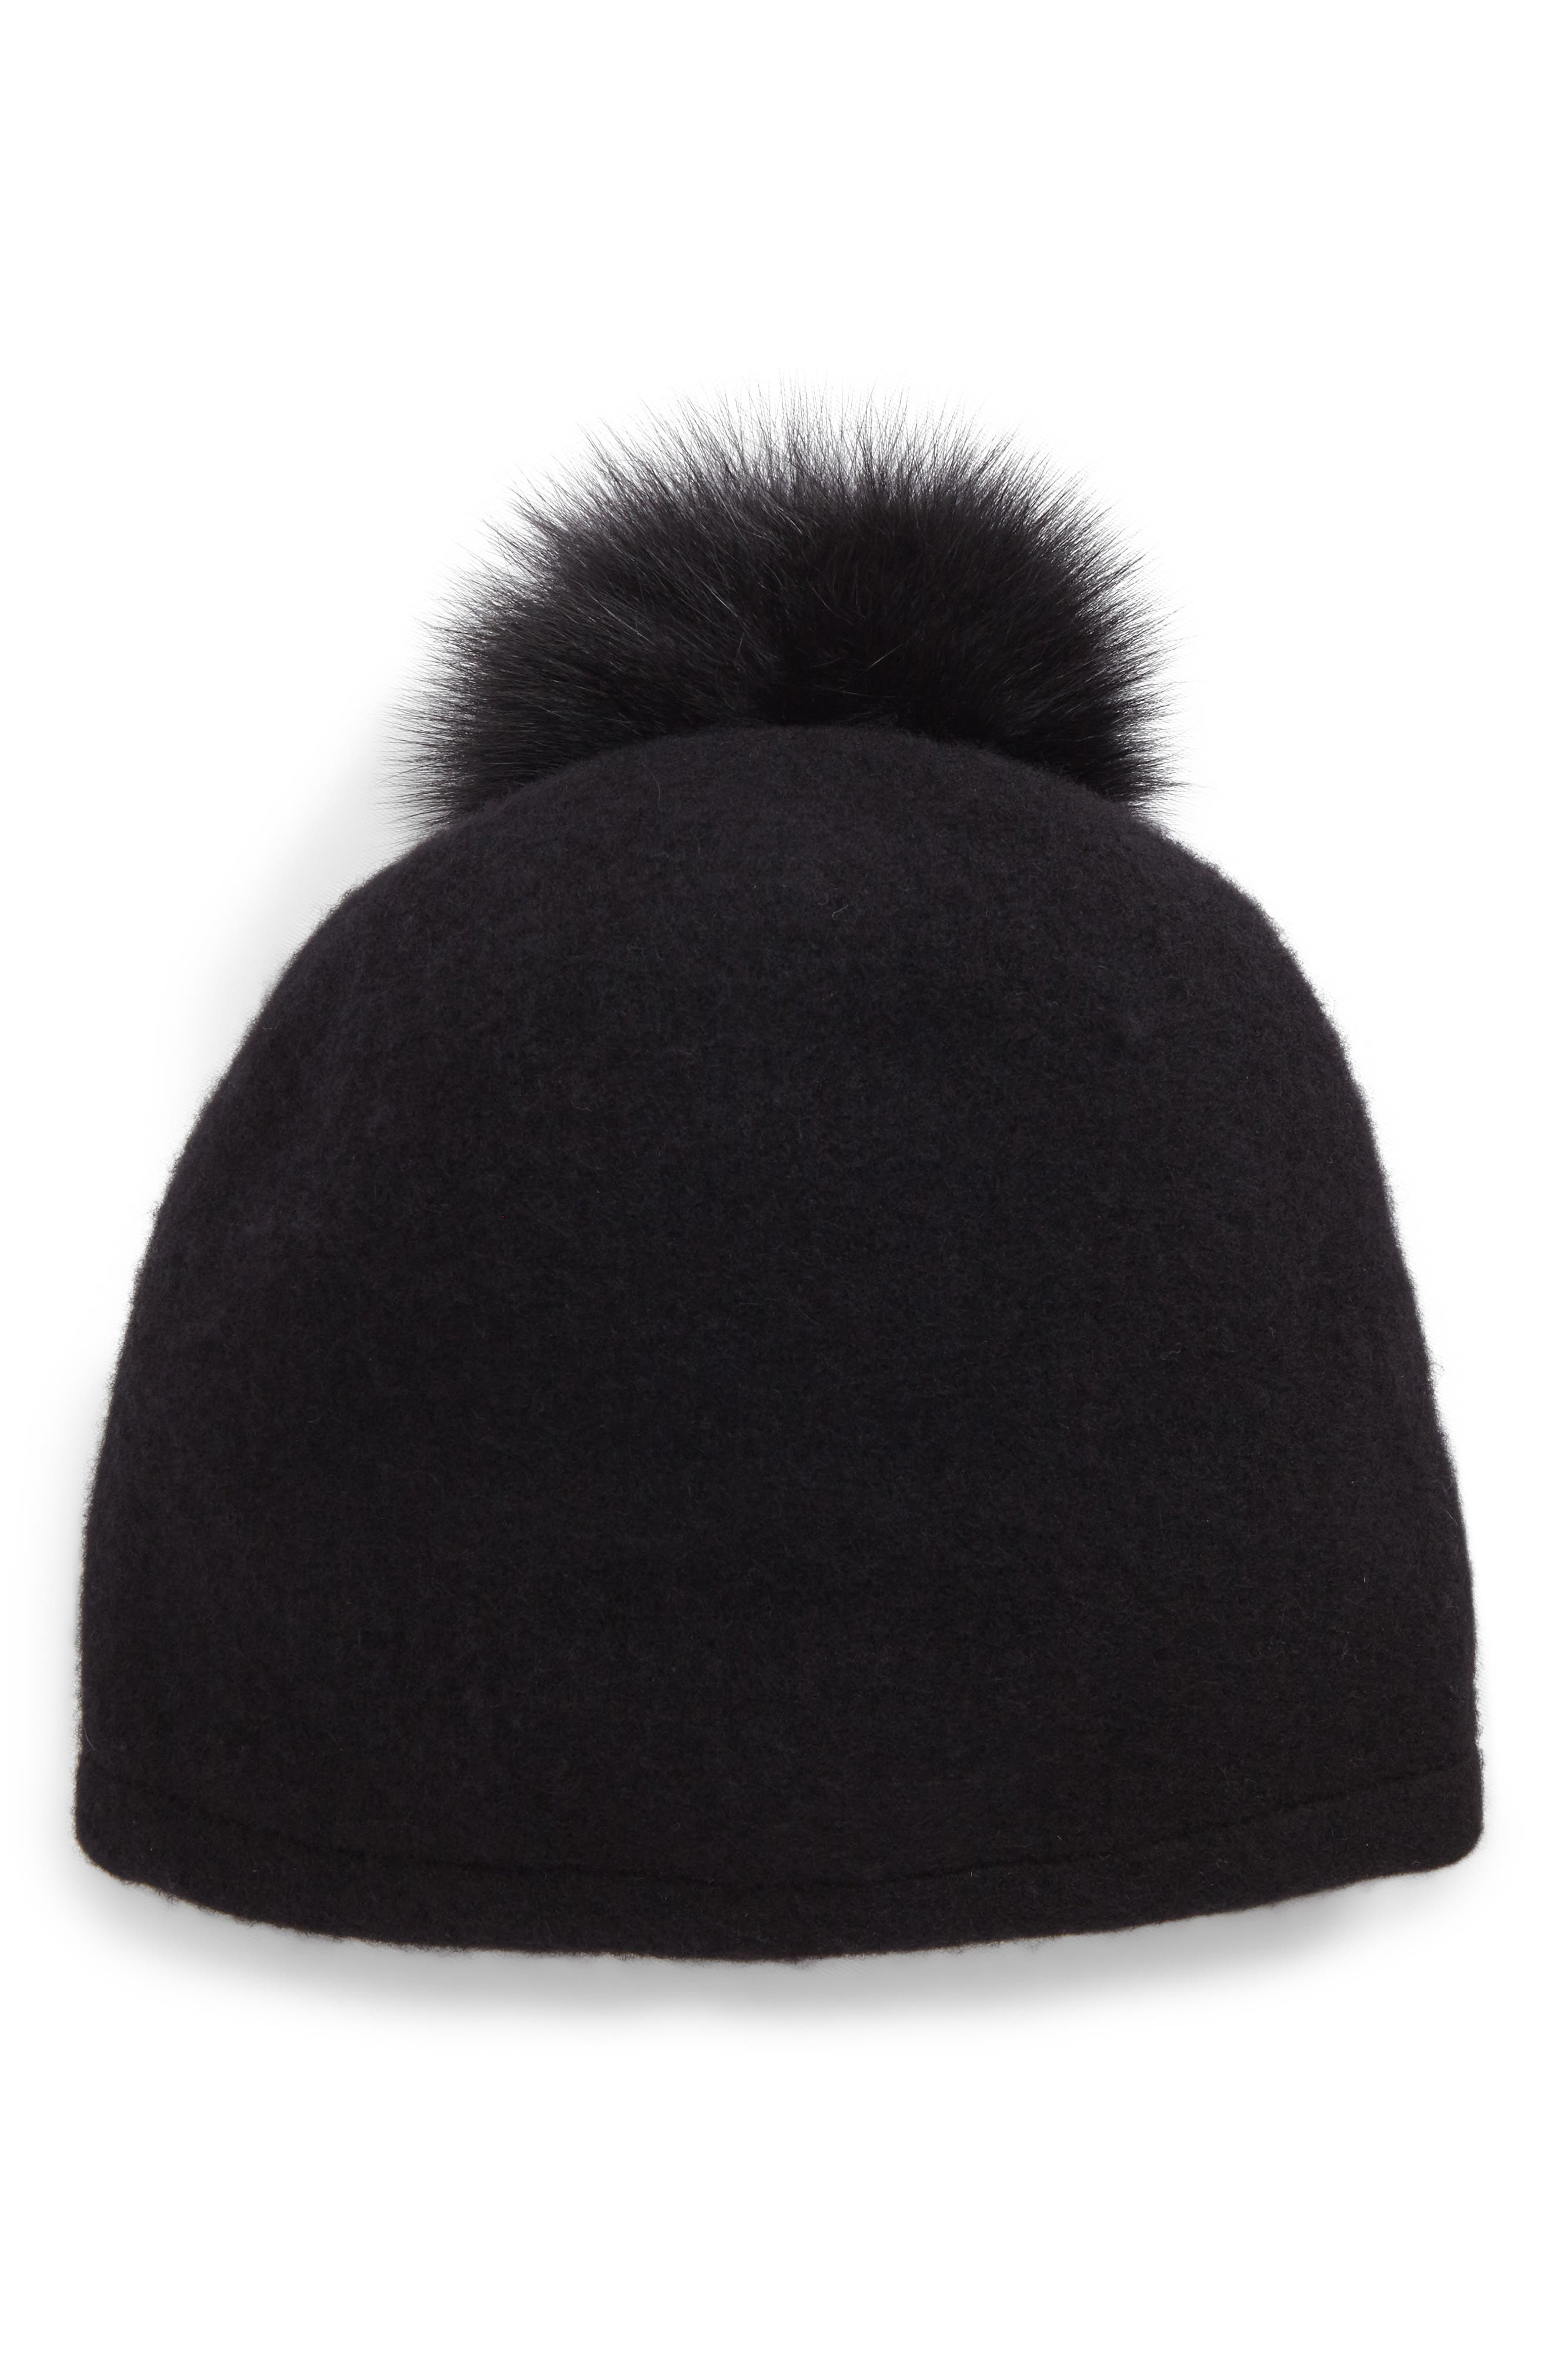 Slouchy Wool Knit Beanie with Genuine Fox Fur Pom,                         Main,                         color, Black/Black